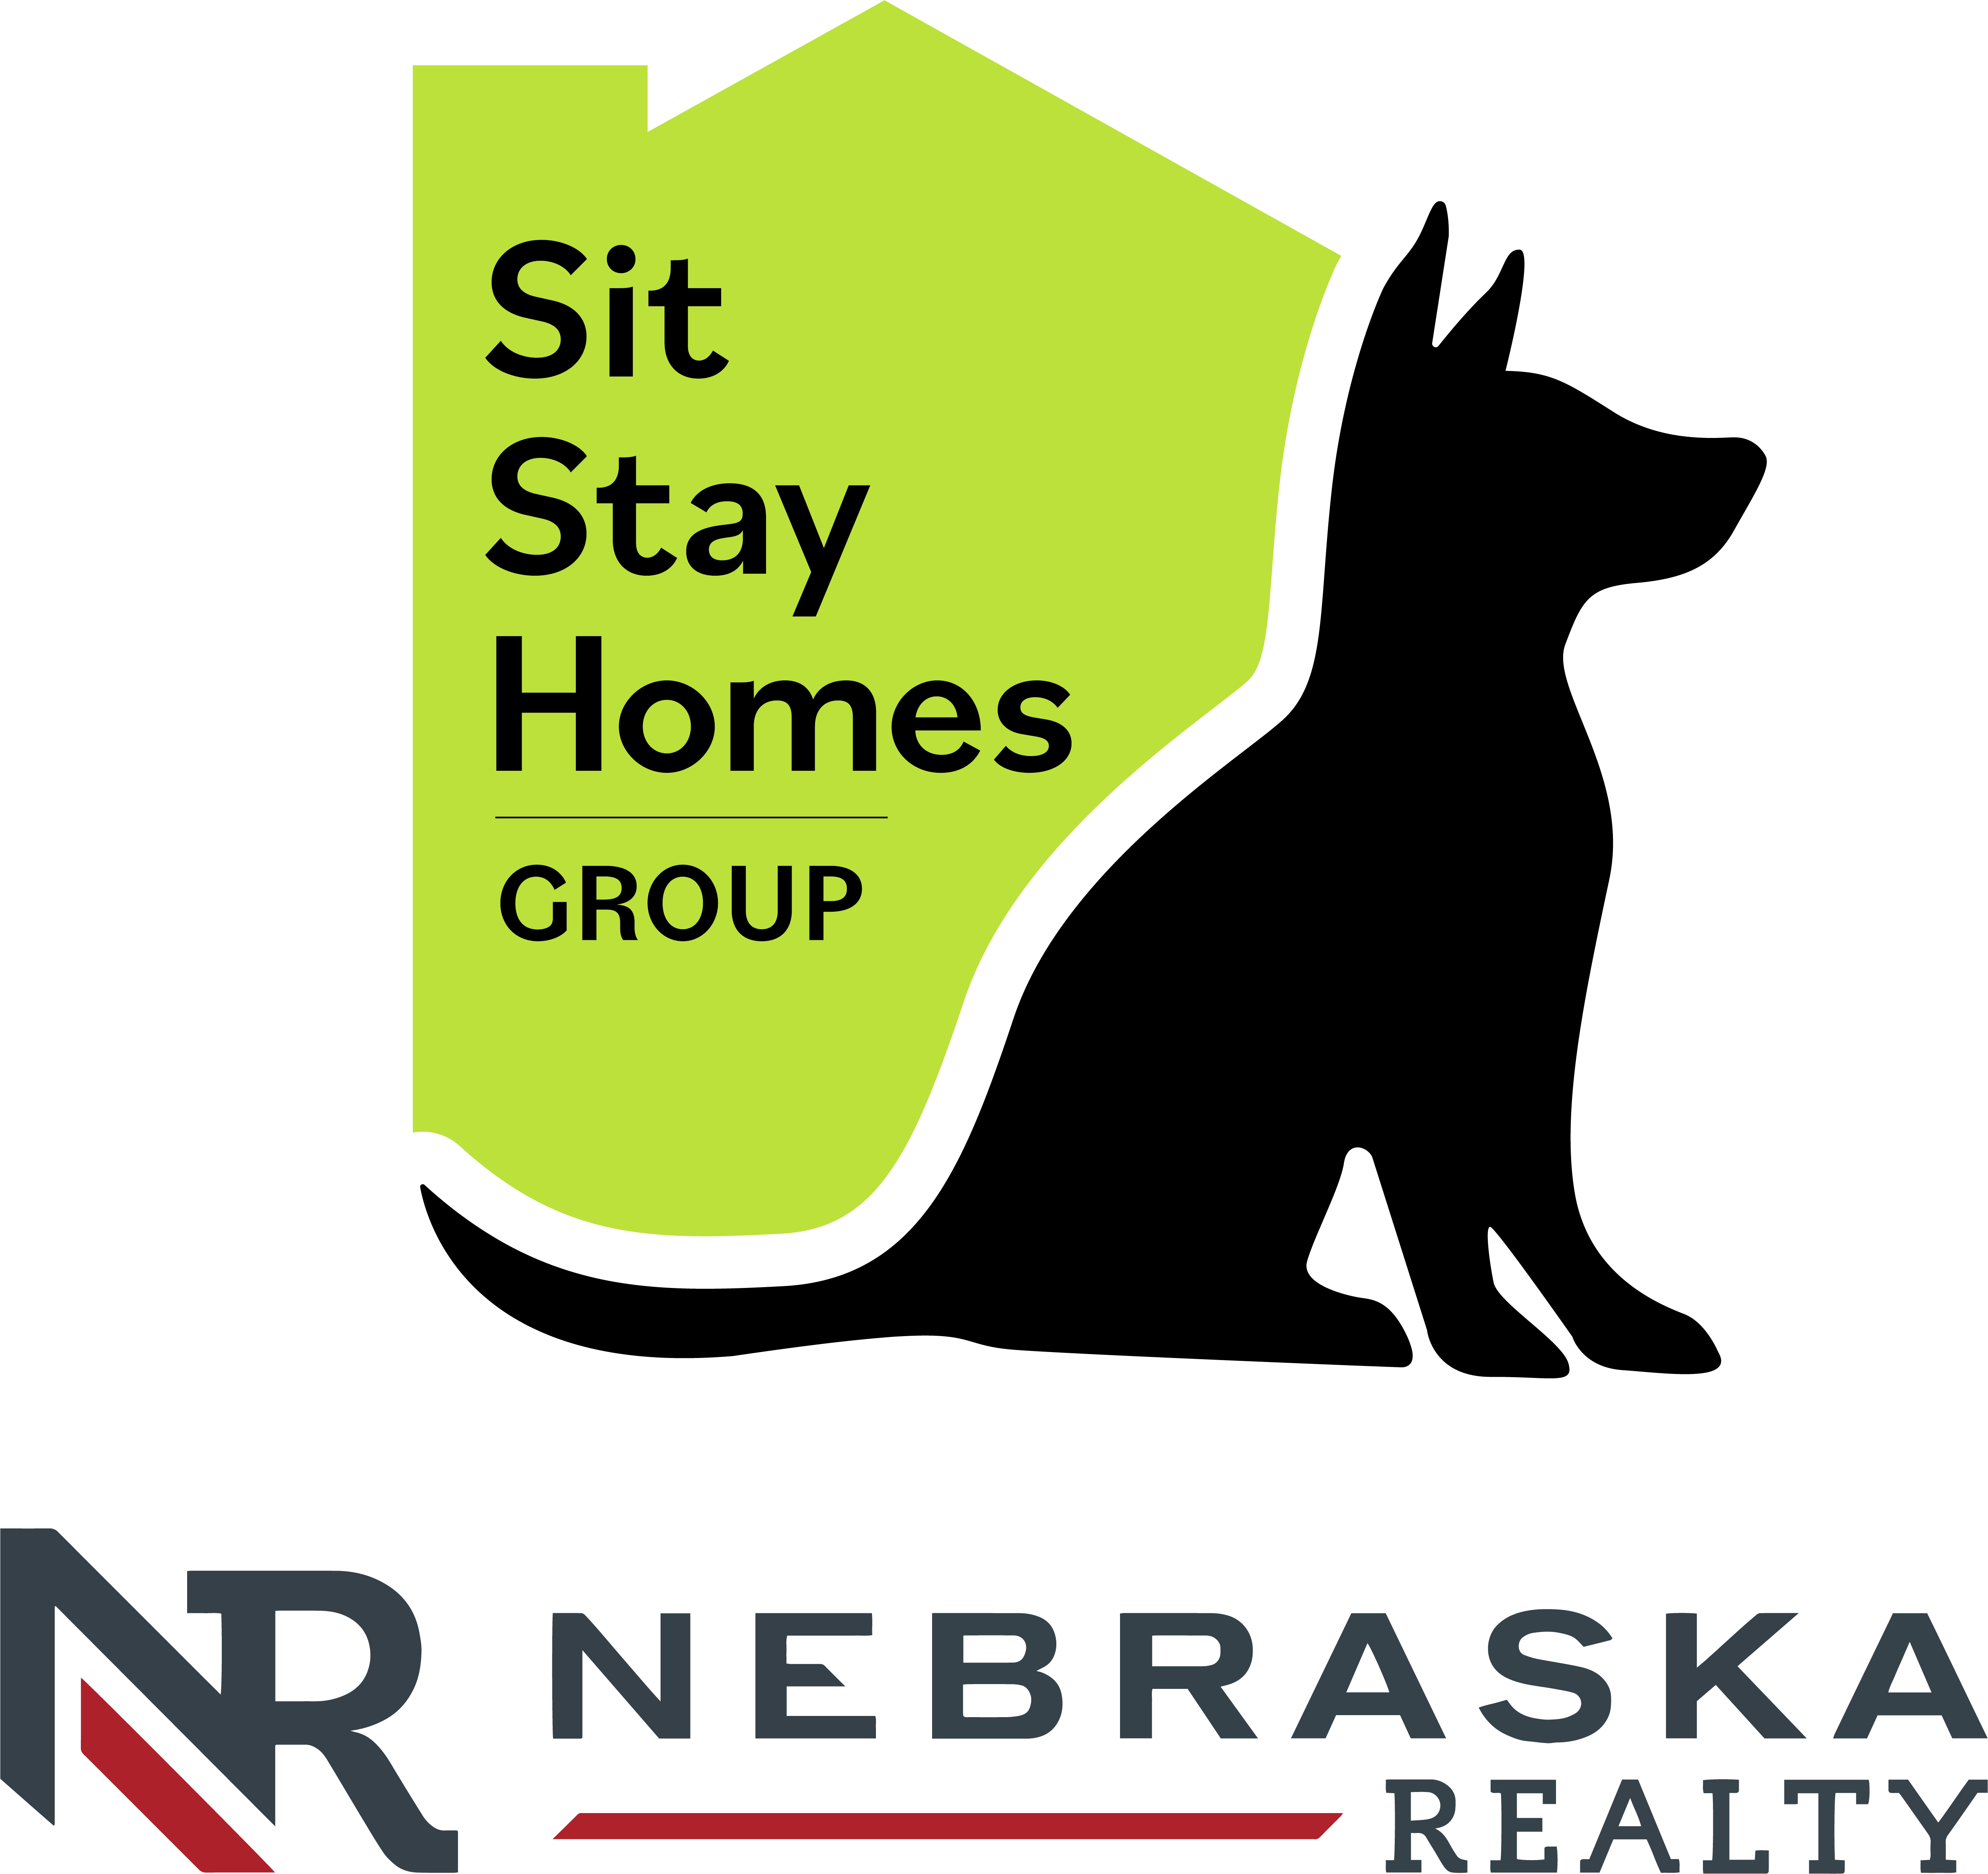 Sit Stay Homes Group at Nebraska Realty logo